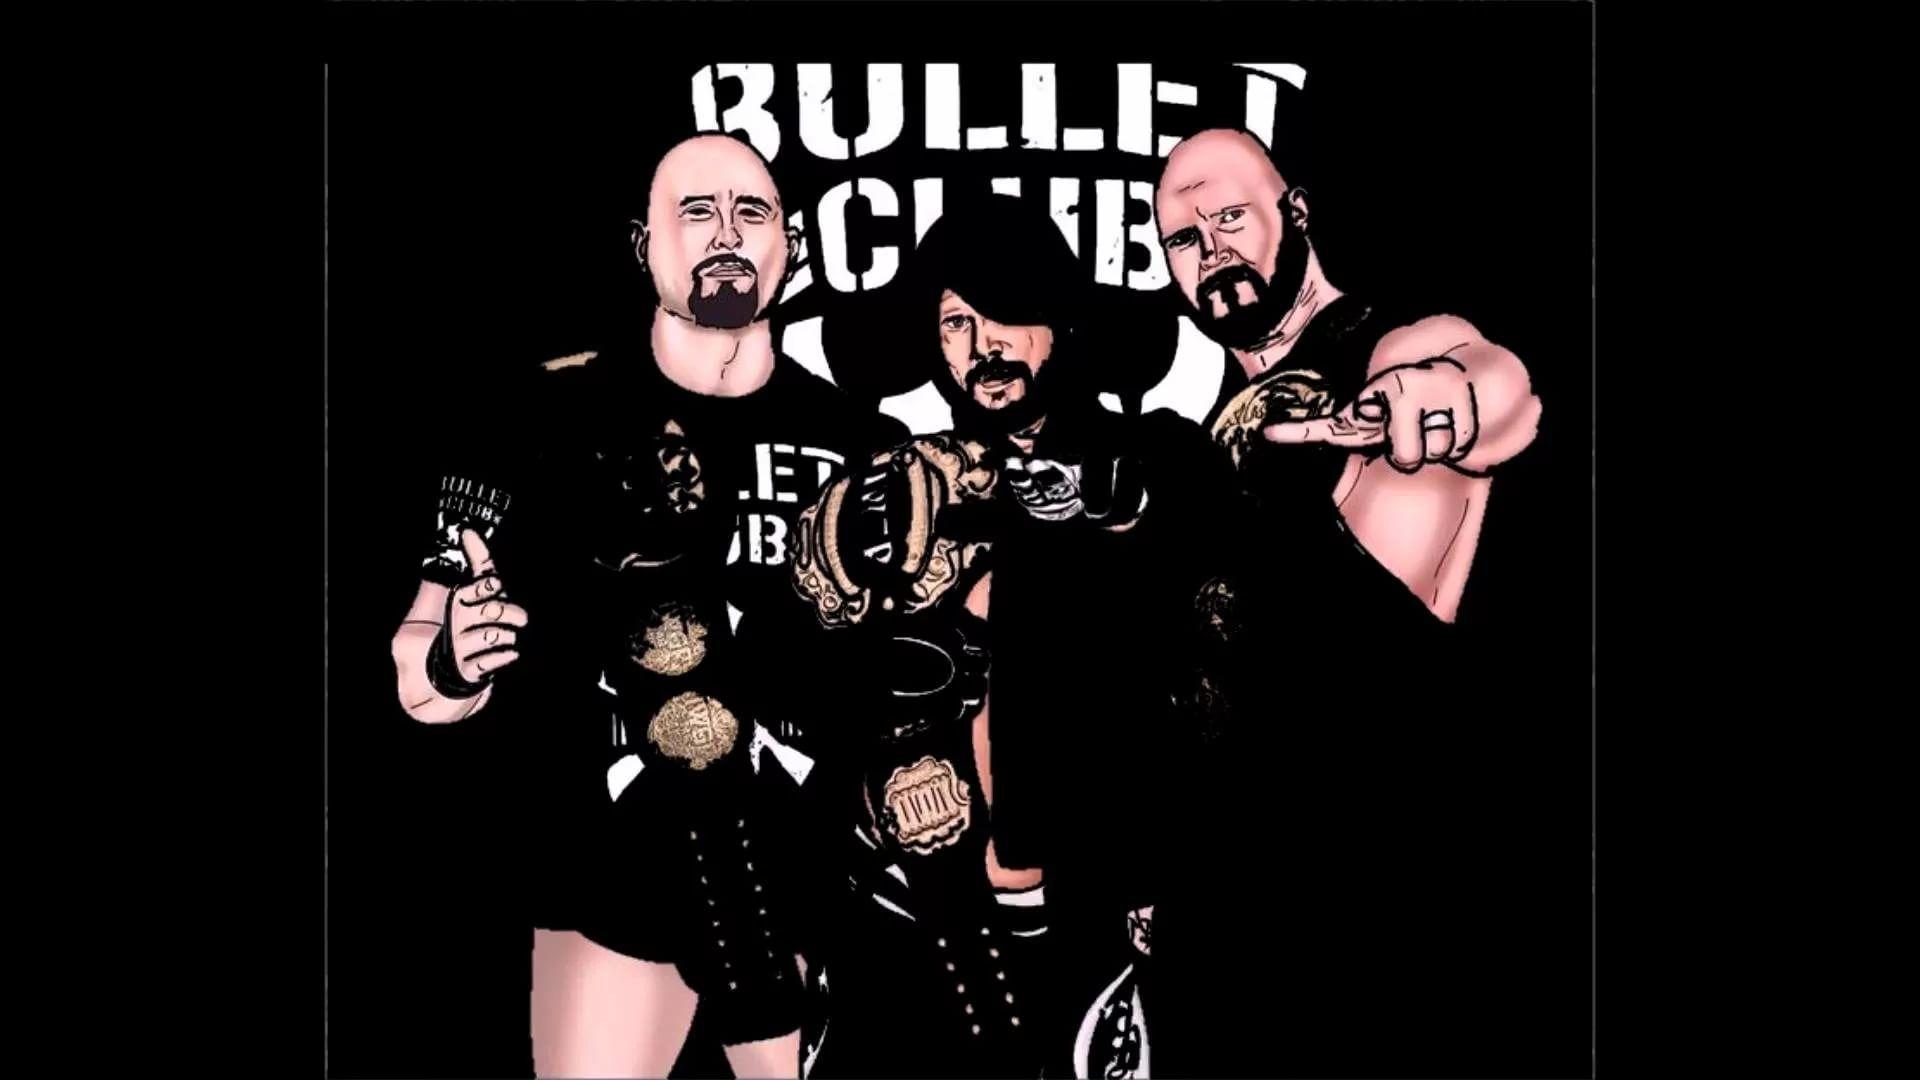 Bullet Club hd wallpaper 1080p for pc